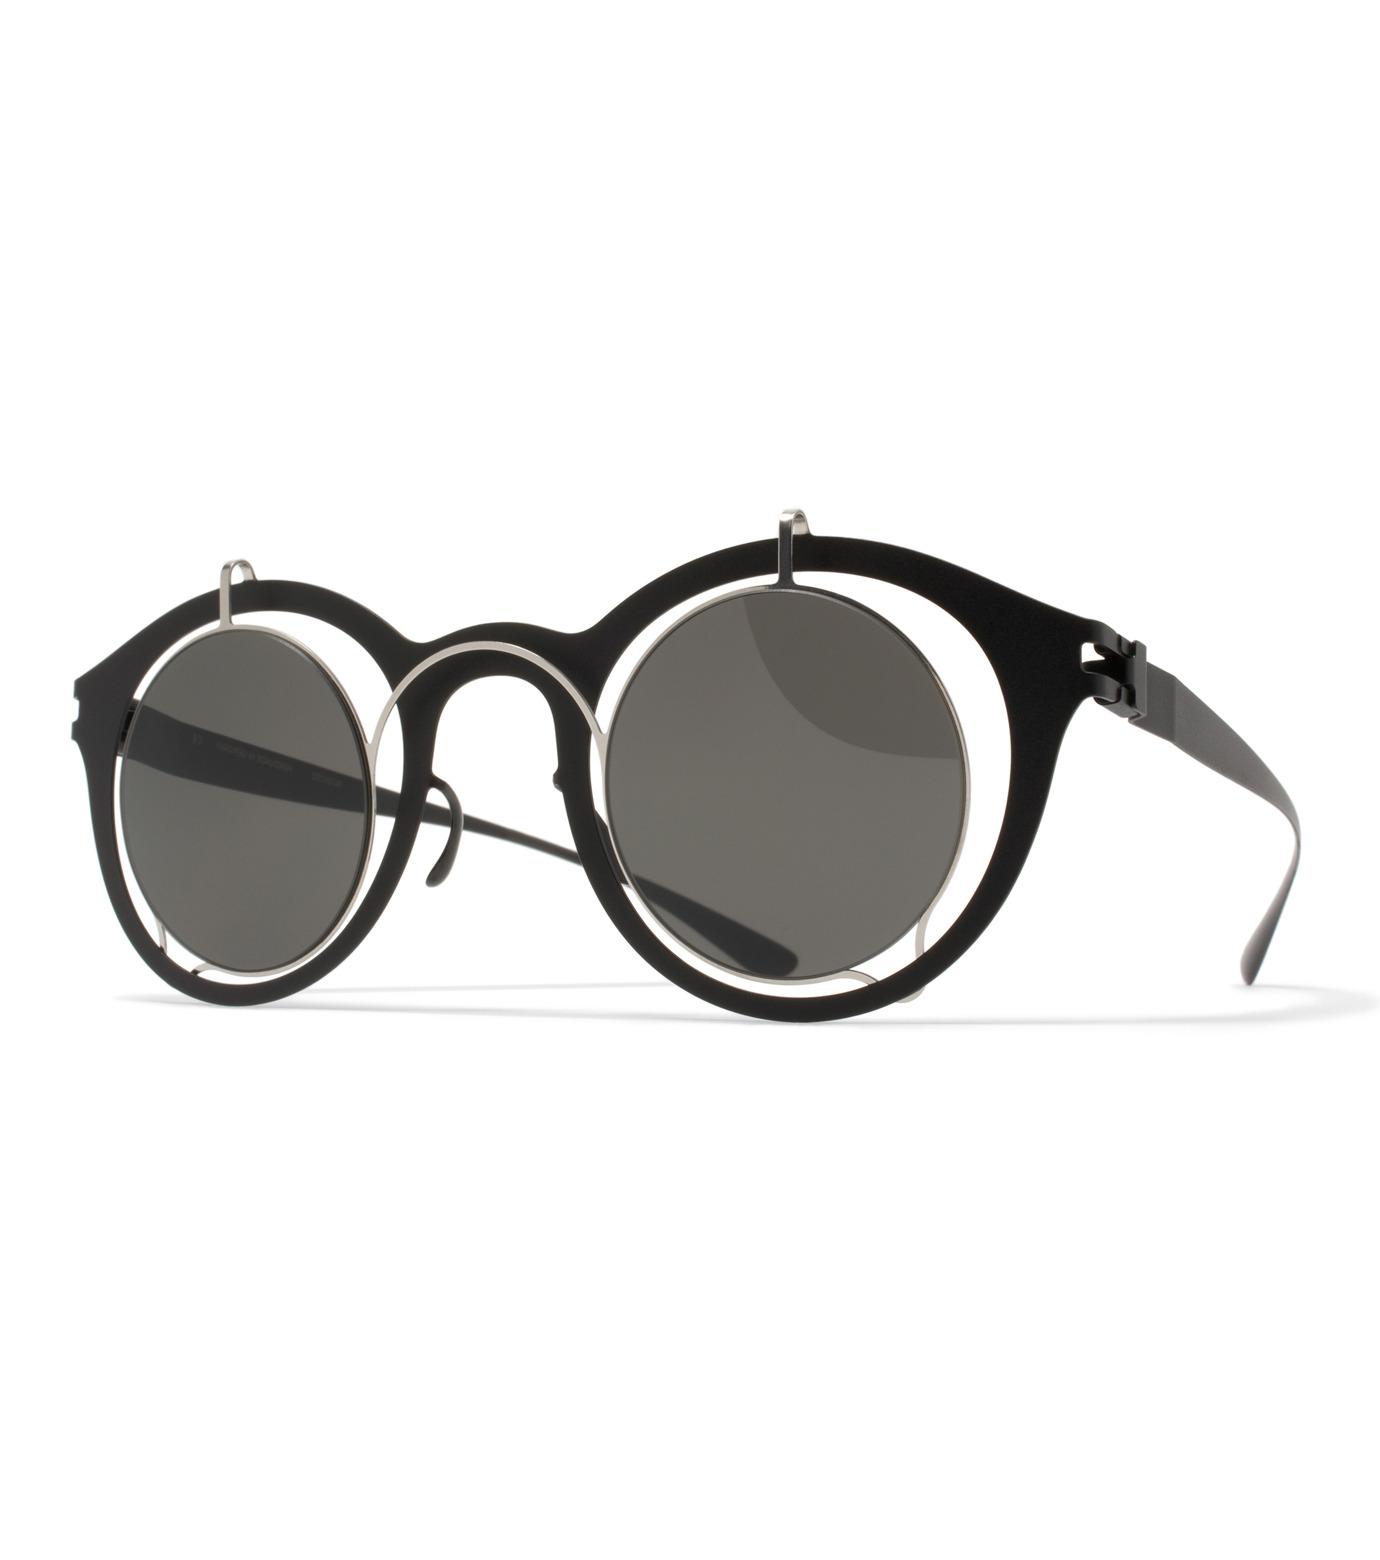 MYKITA(マイキータ)のBRADFIELD SUN-BLACK(アイウェア/eyewear)-BRADFIELDSUN-13 拡大詳細画像1